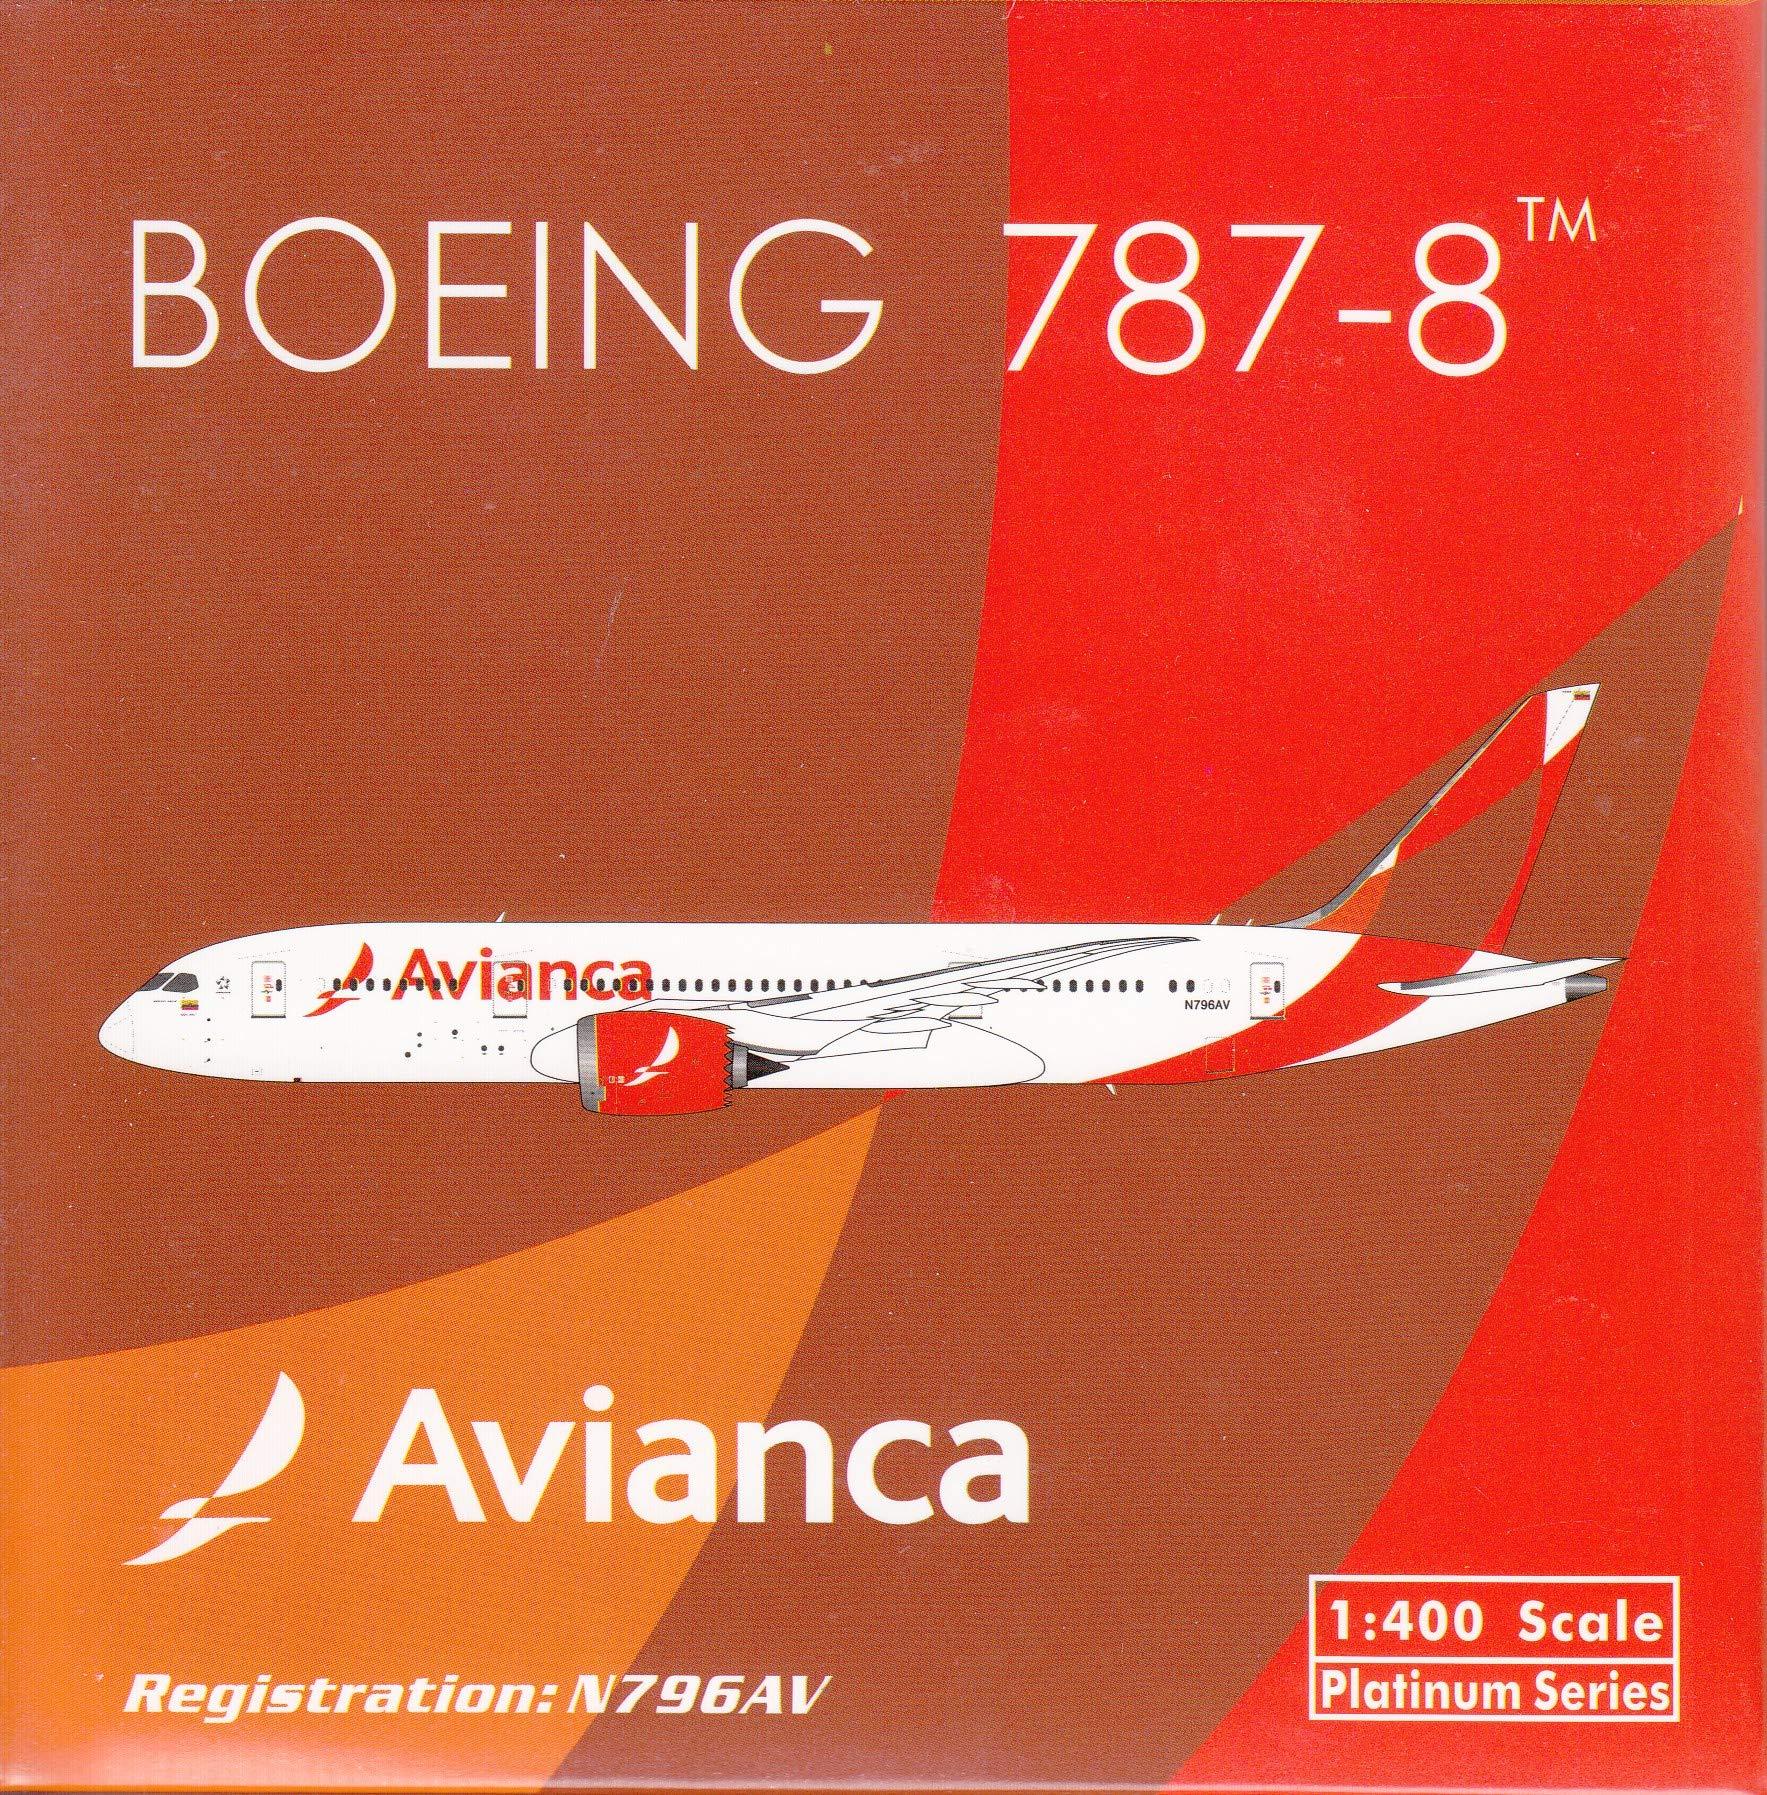 Phoenix Model PHX11505 1:400 Avianca Boeing 787-8 Reg #N796AV (pre-Painted/pre-Built)